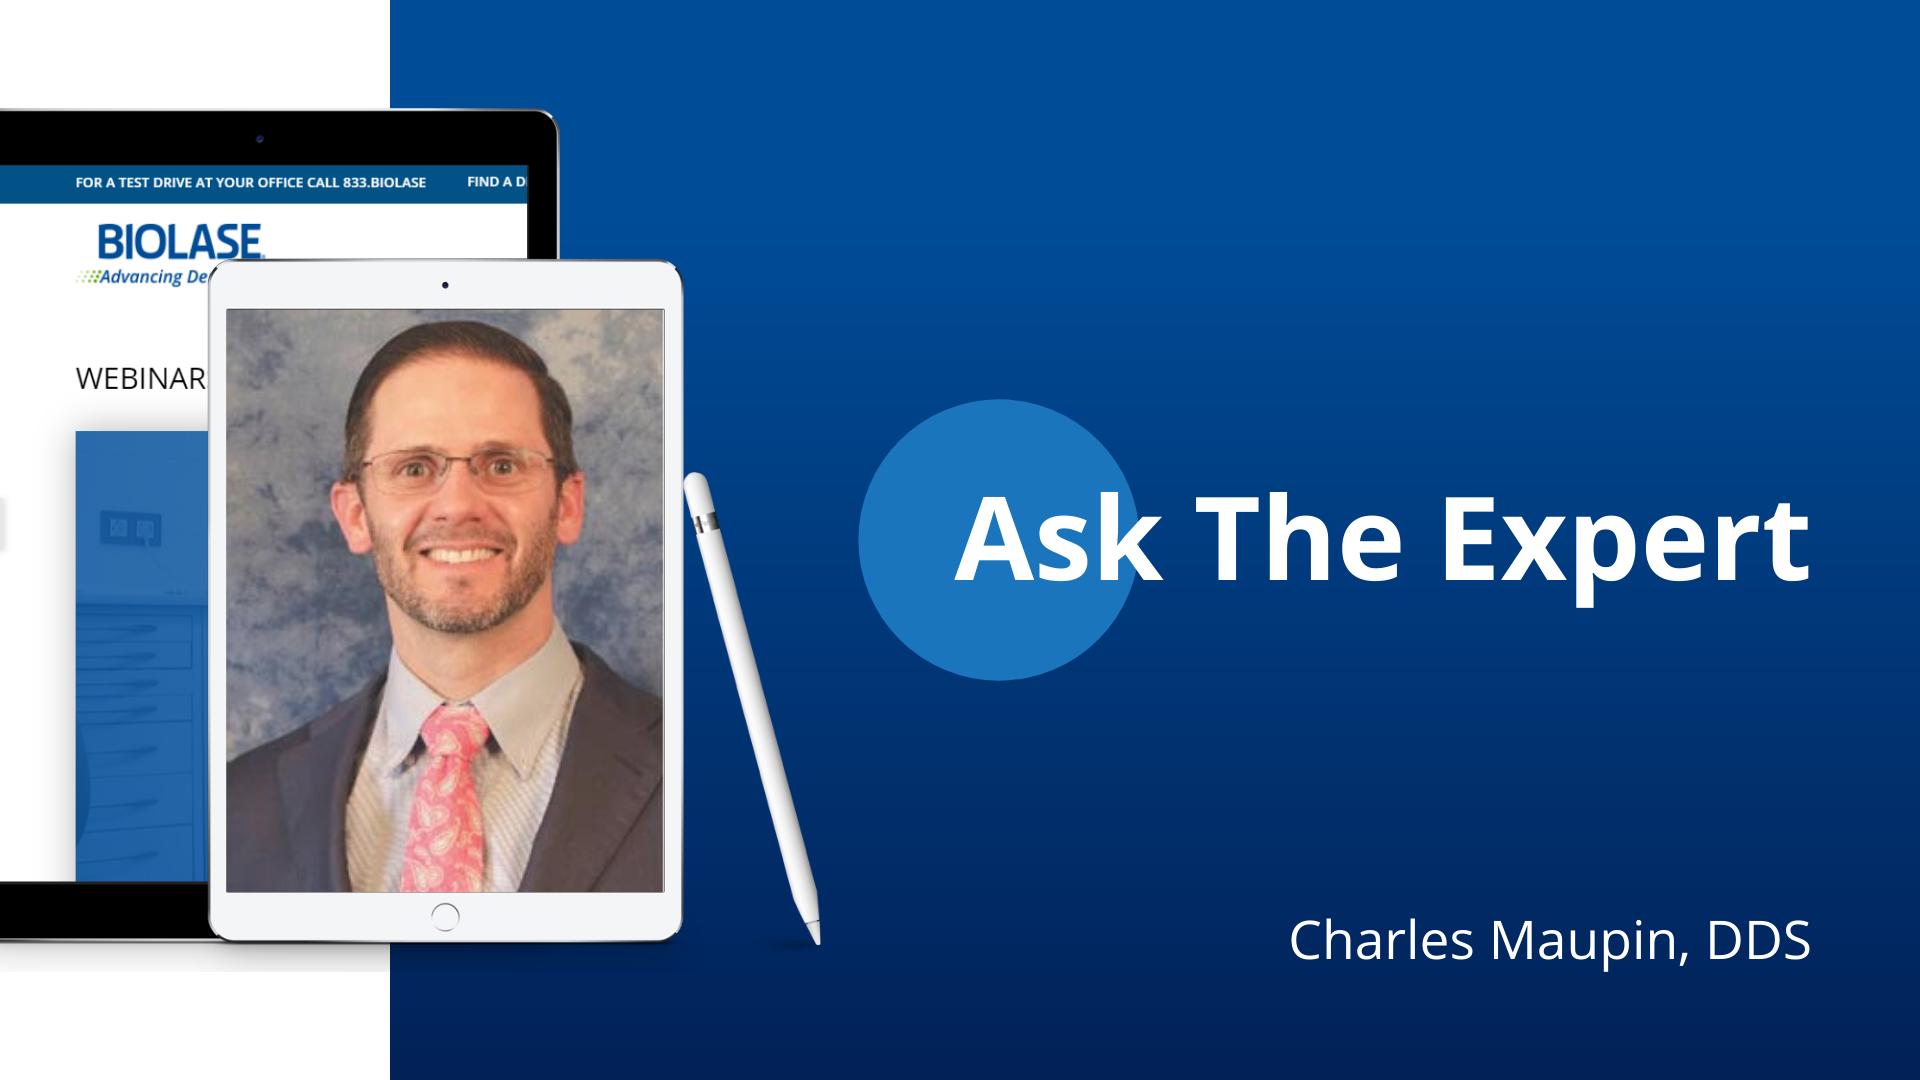 ask-the-expert-maupin